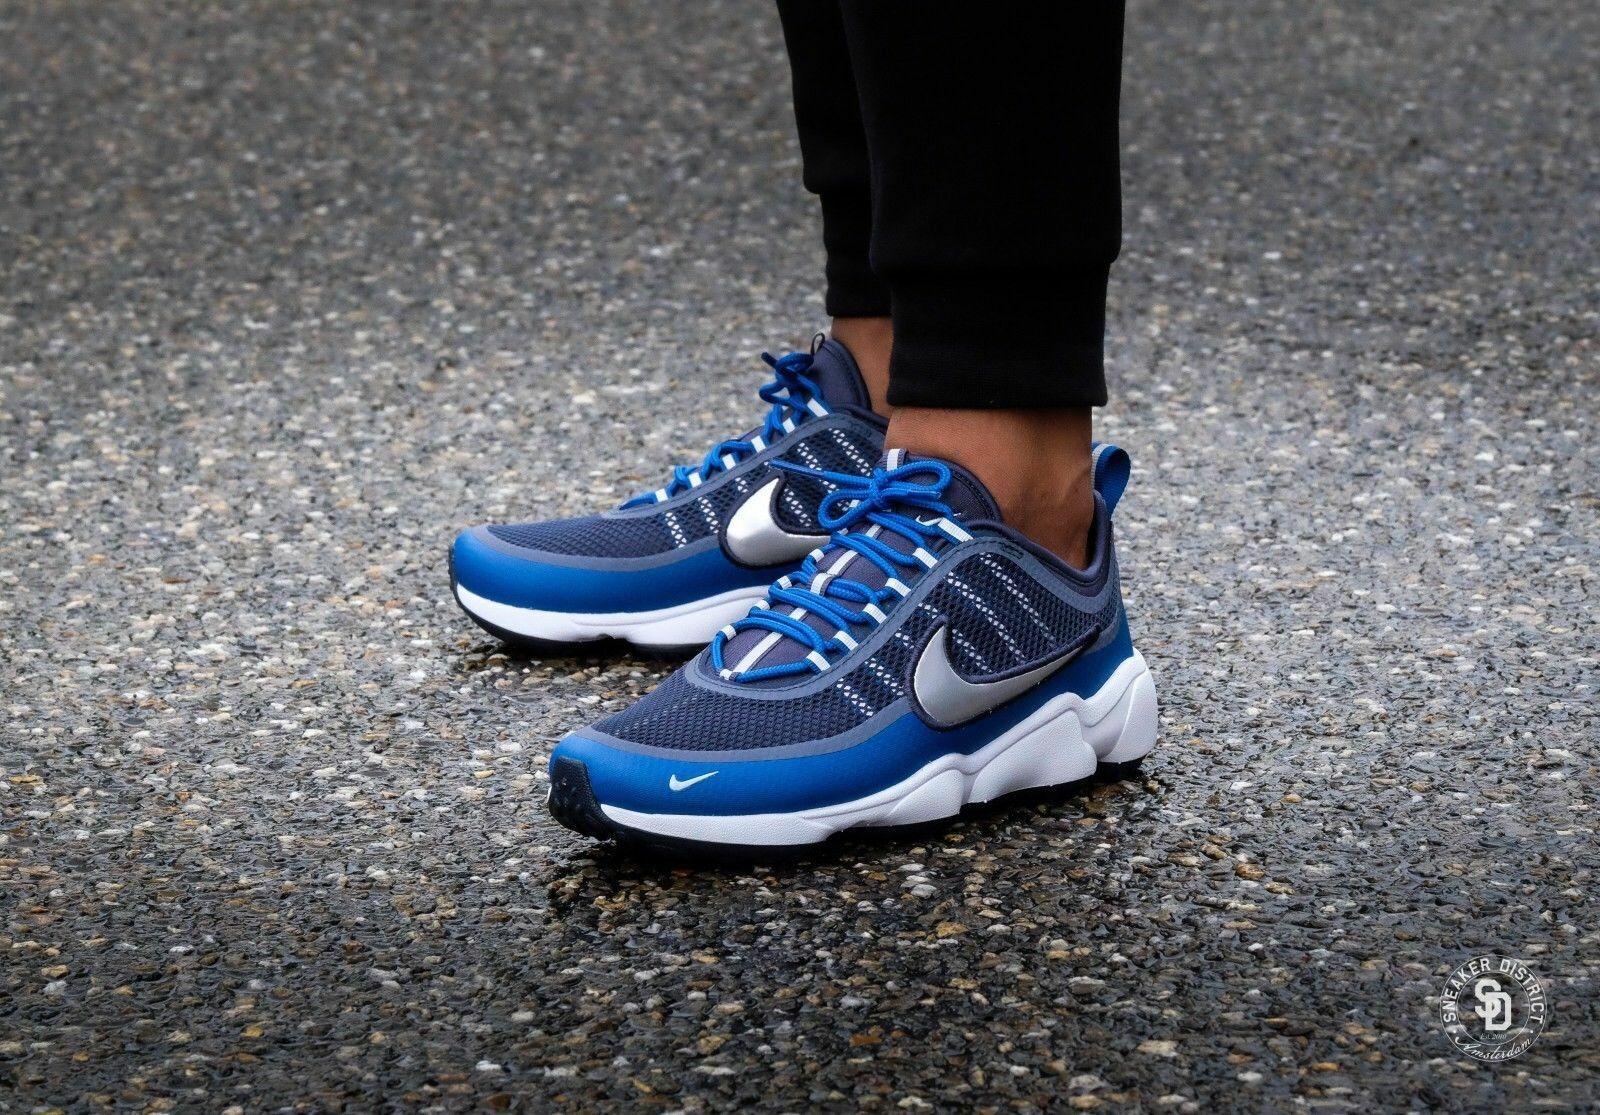 New Nike Zoom Spiridon Men's Running Training shoes Armory Navy bluee 876267 401